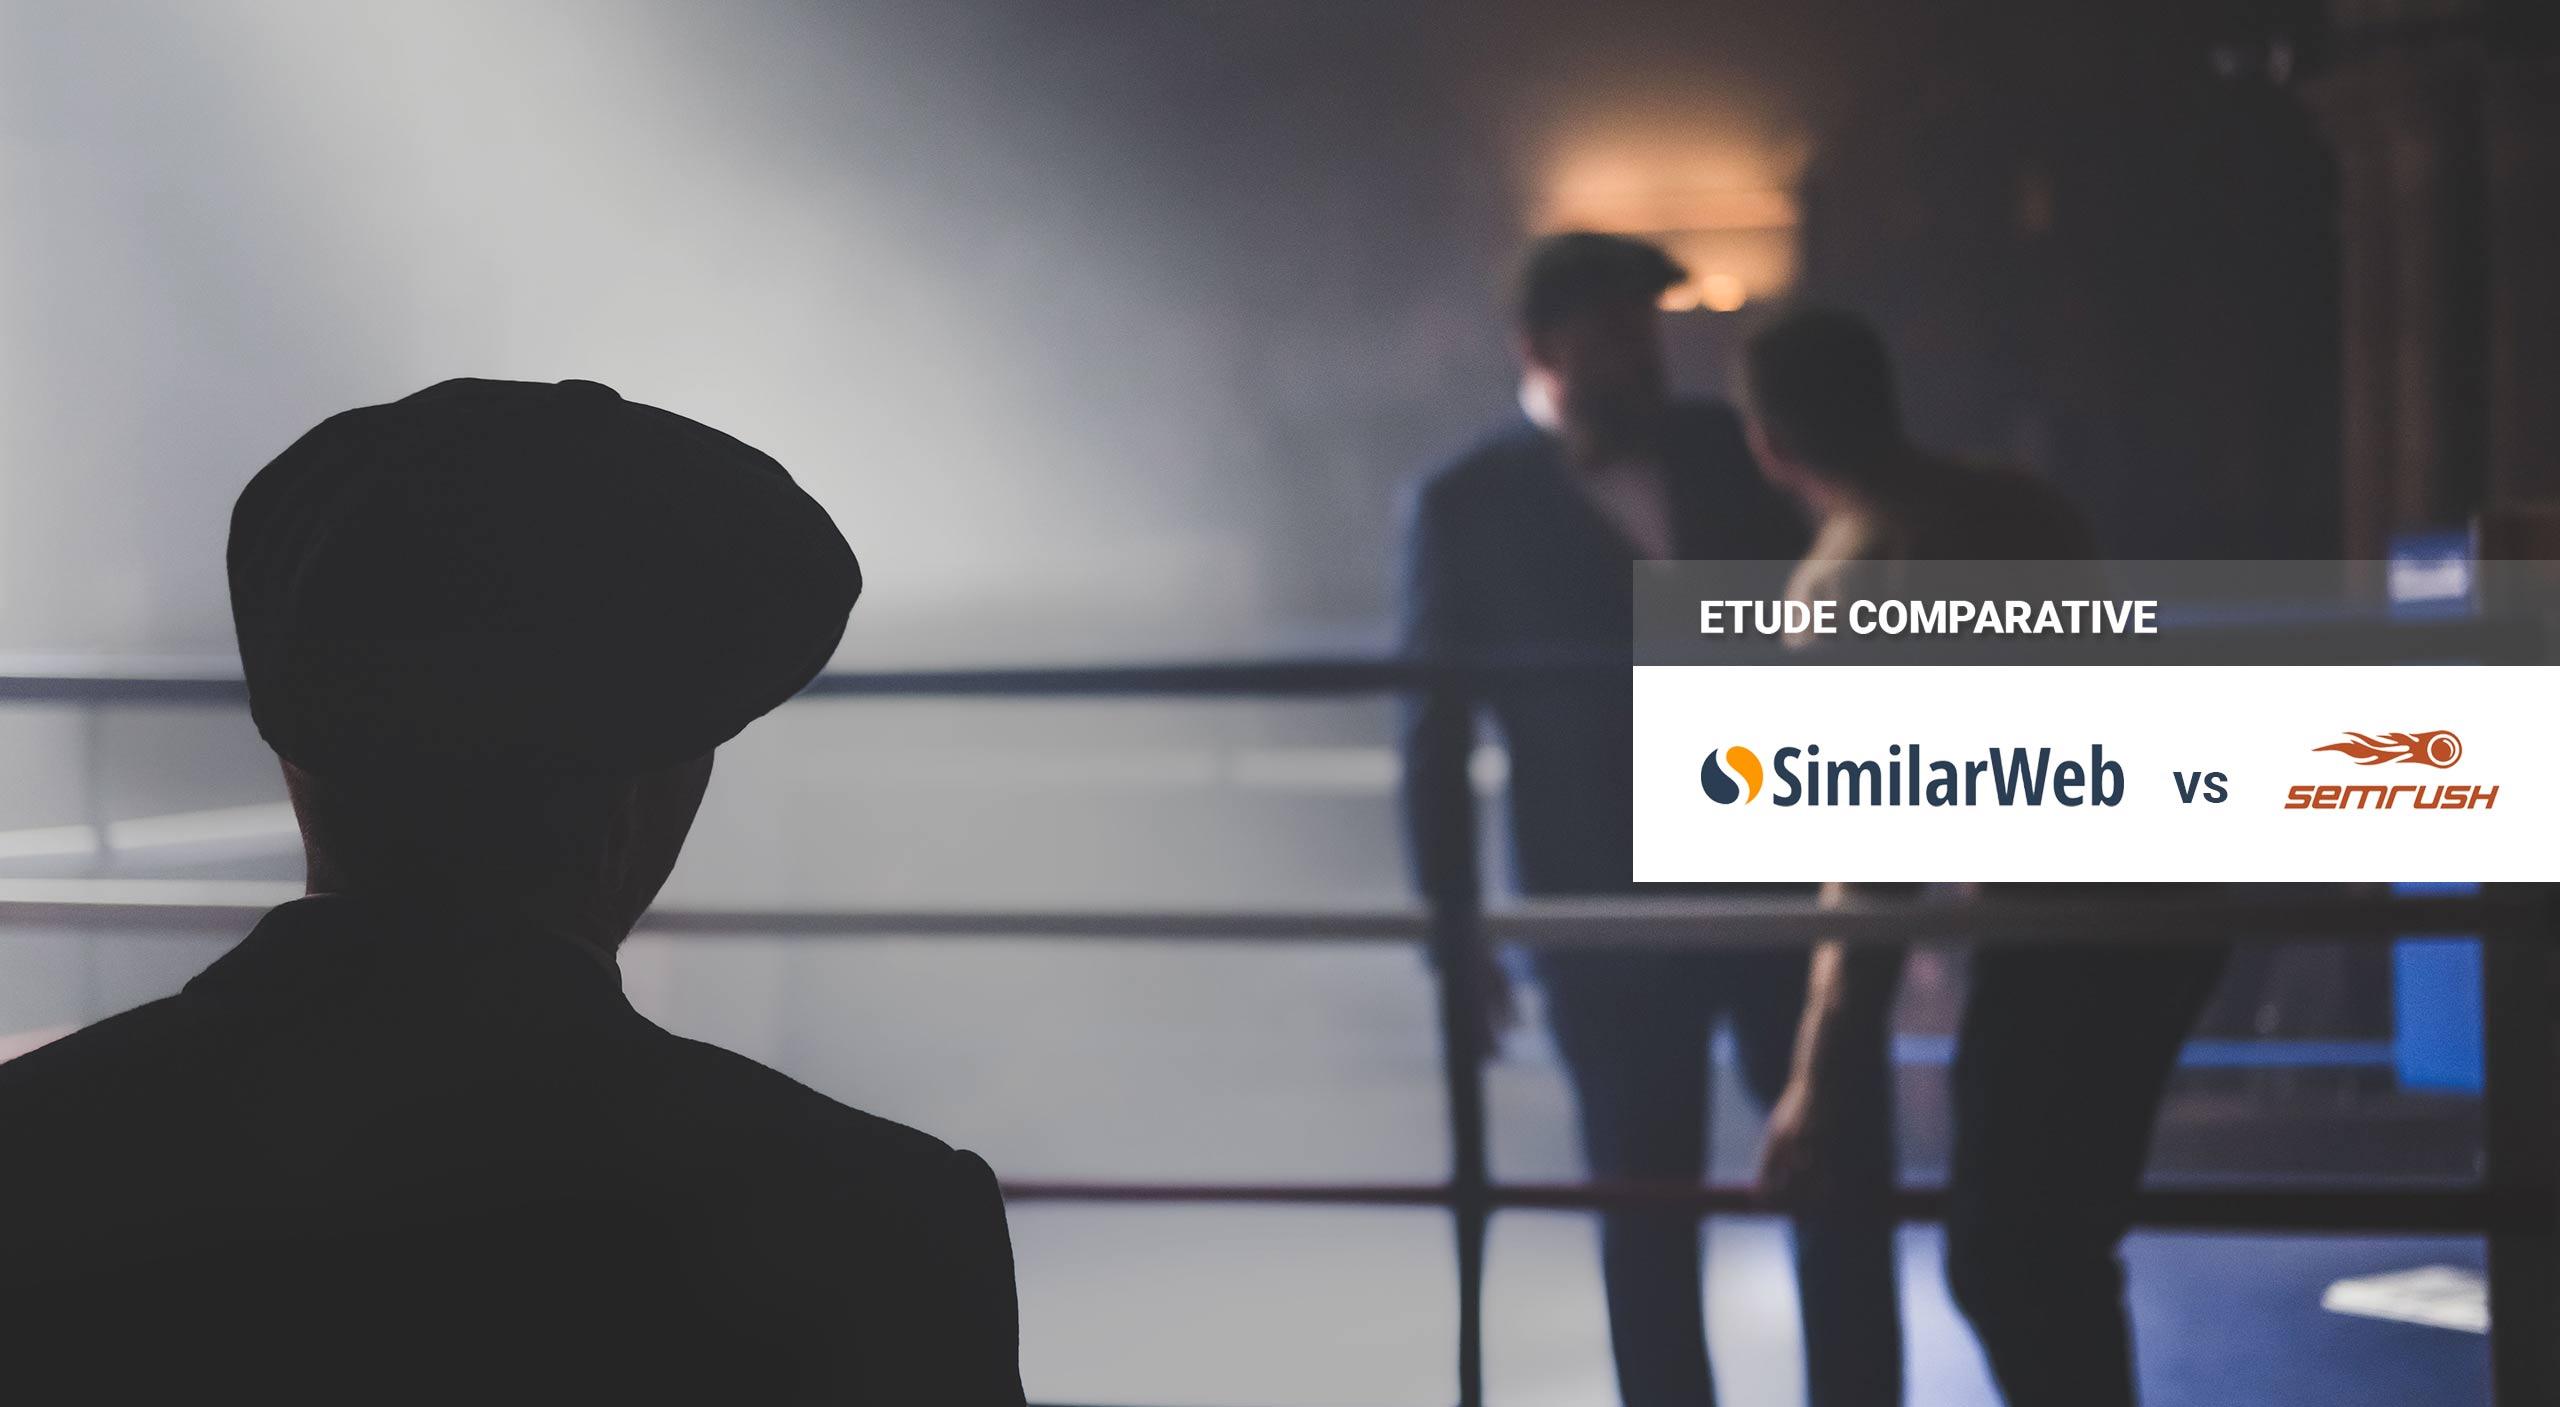 Etude comparative : similarweb vs semrush